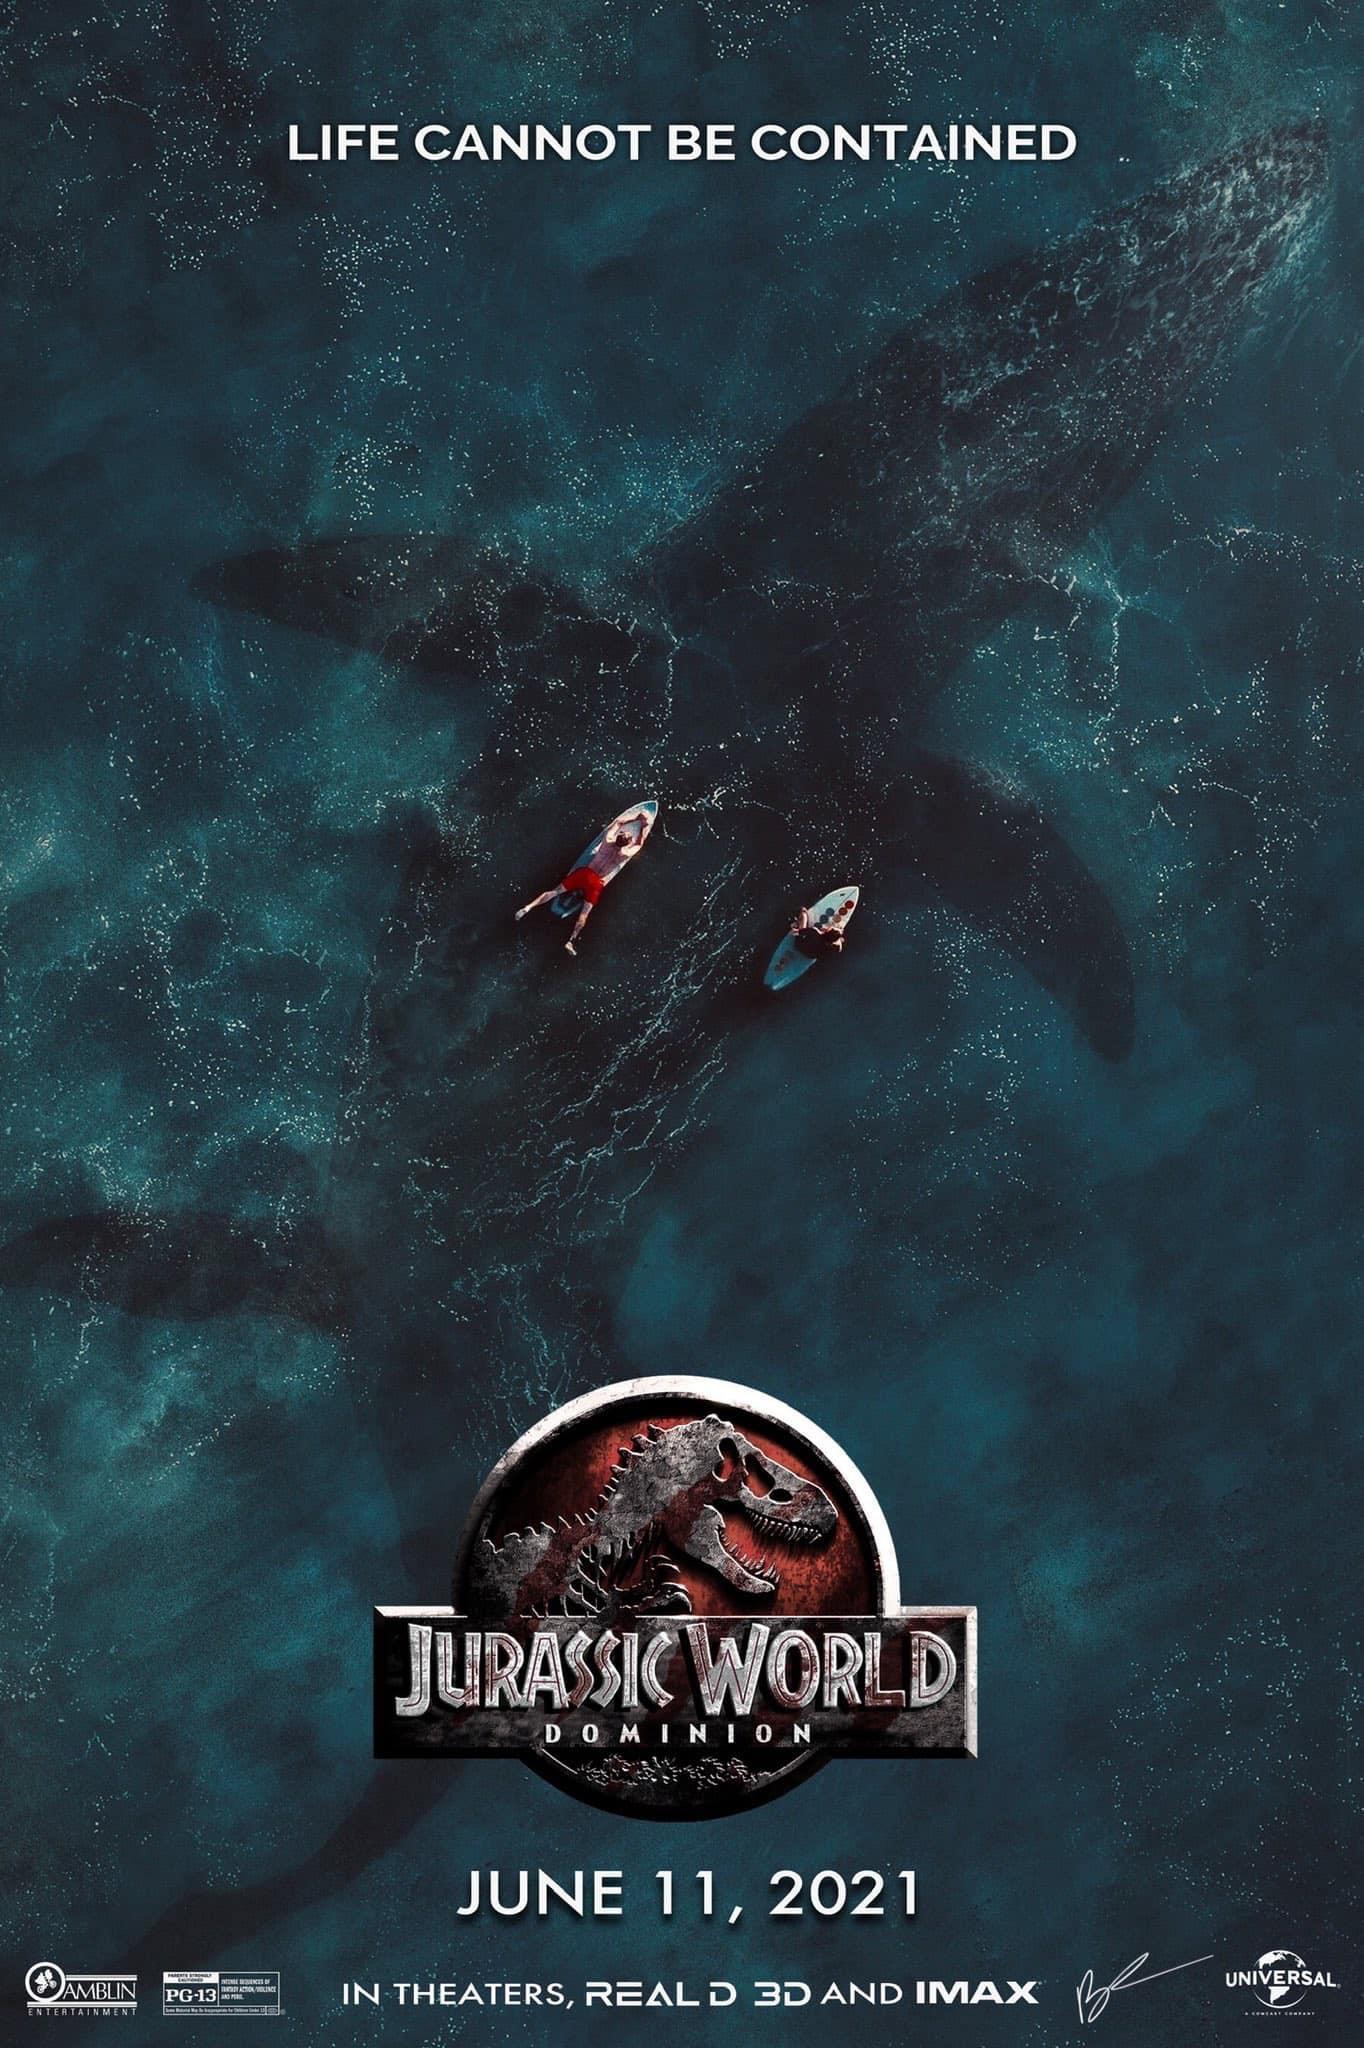 affiche du film Jurassic World: Dominion